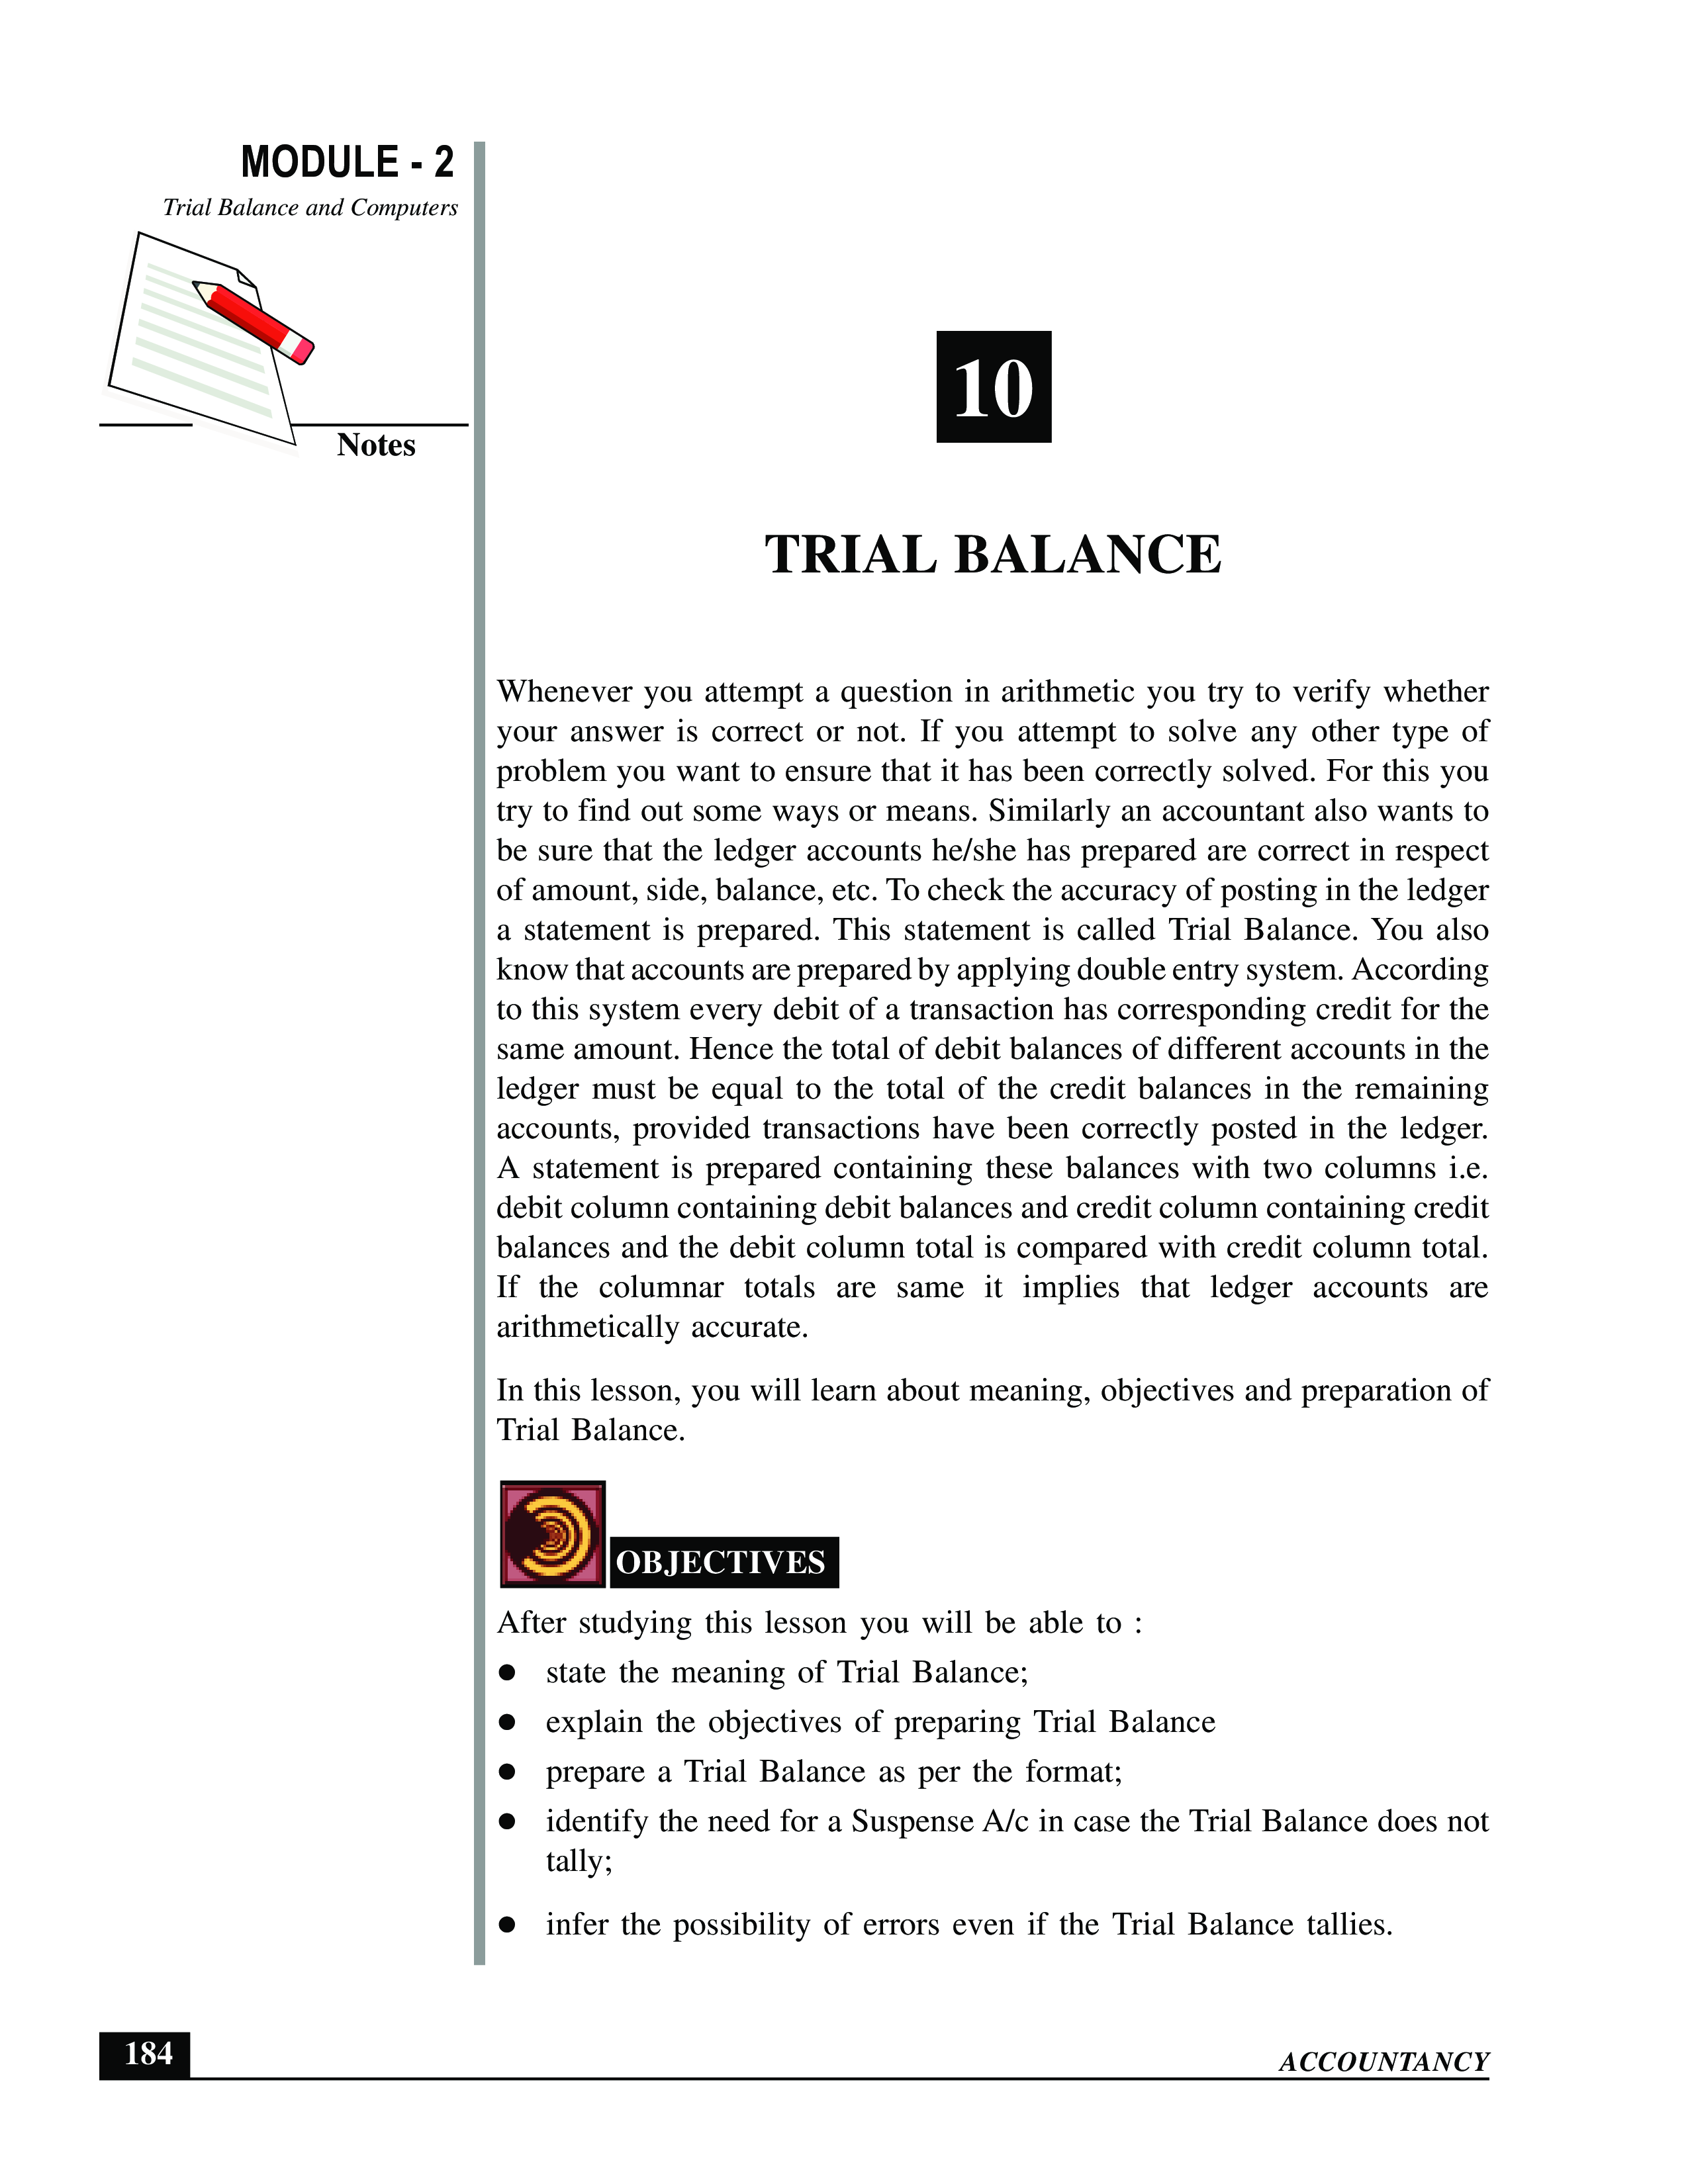 free adjusted trial balance sheet templates at